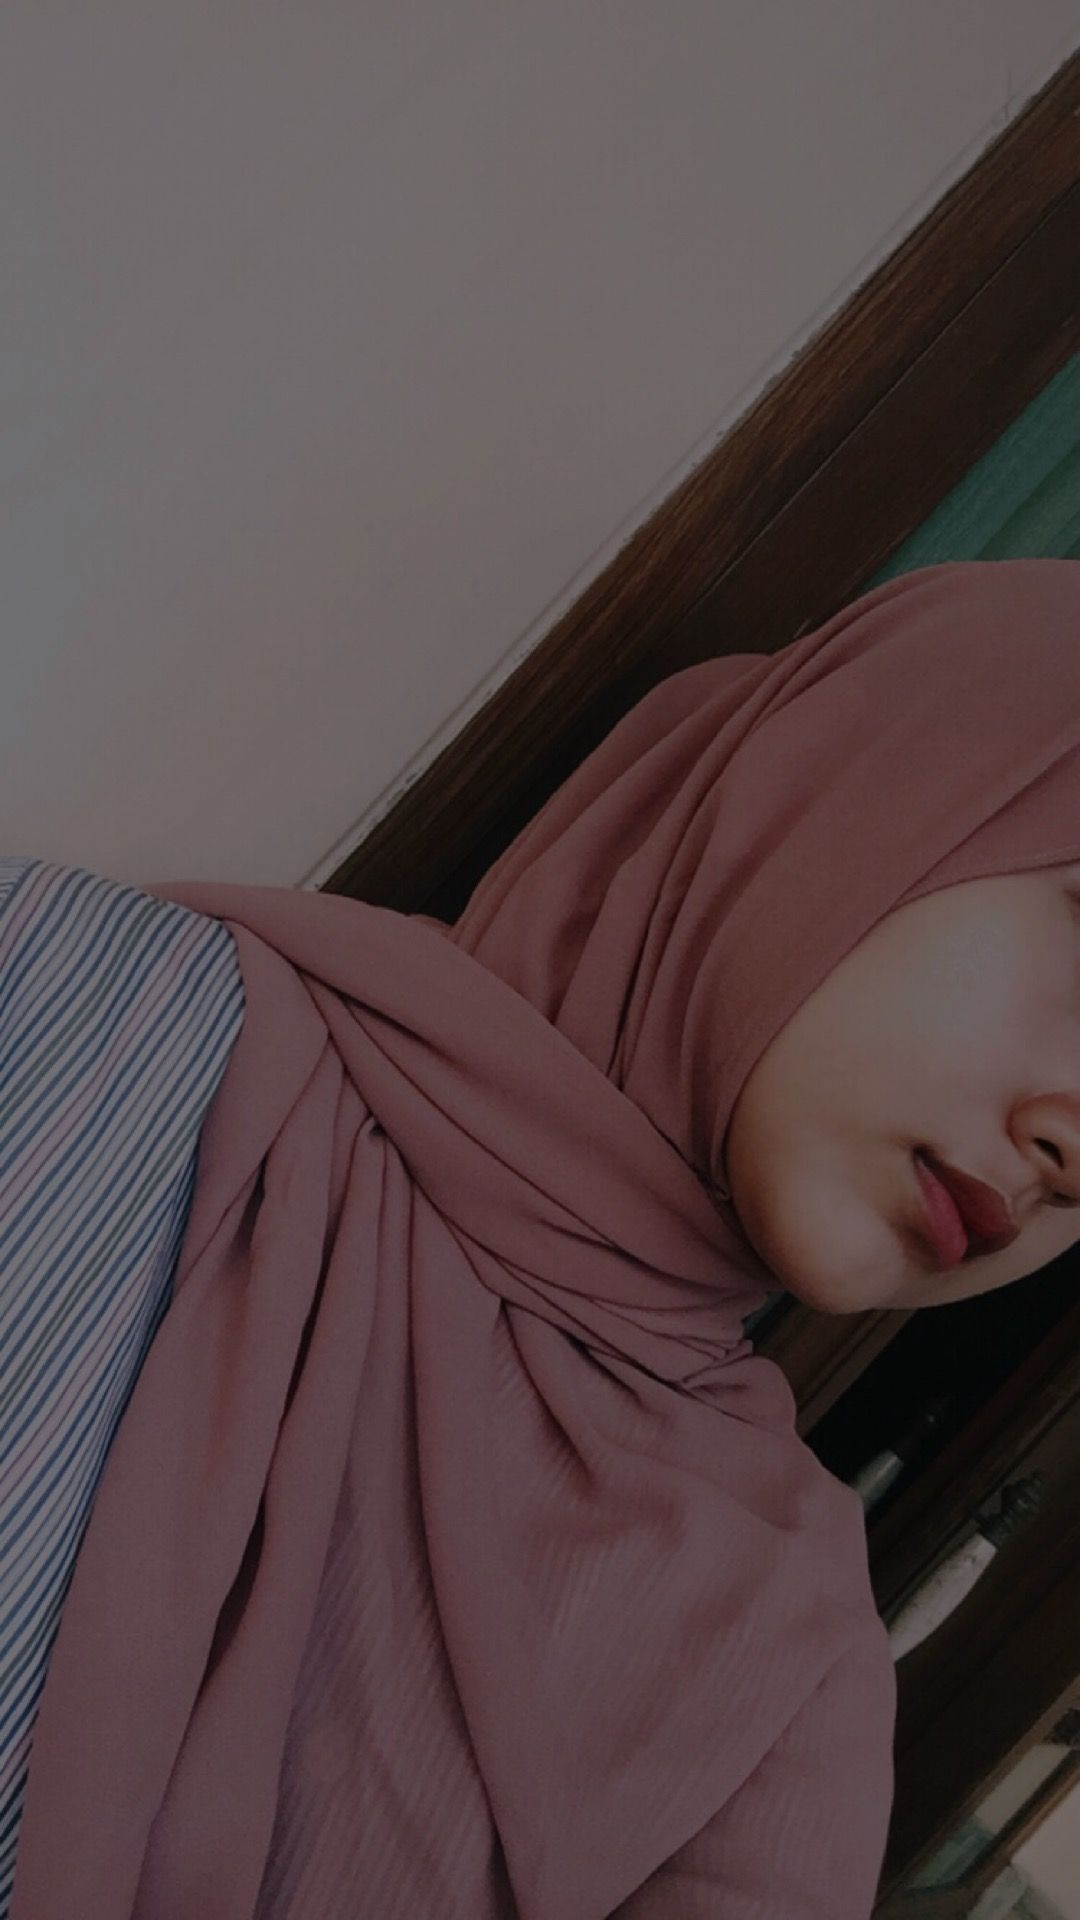 See more ideas about hijabi outfits casual, hijab fashion, hijabi fashion. Pin Oleh ضہ ہ حہڪة ألمہ Di Hijab Gaya Remaja Gambar Gadis Cantik Potret Diri